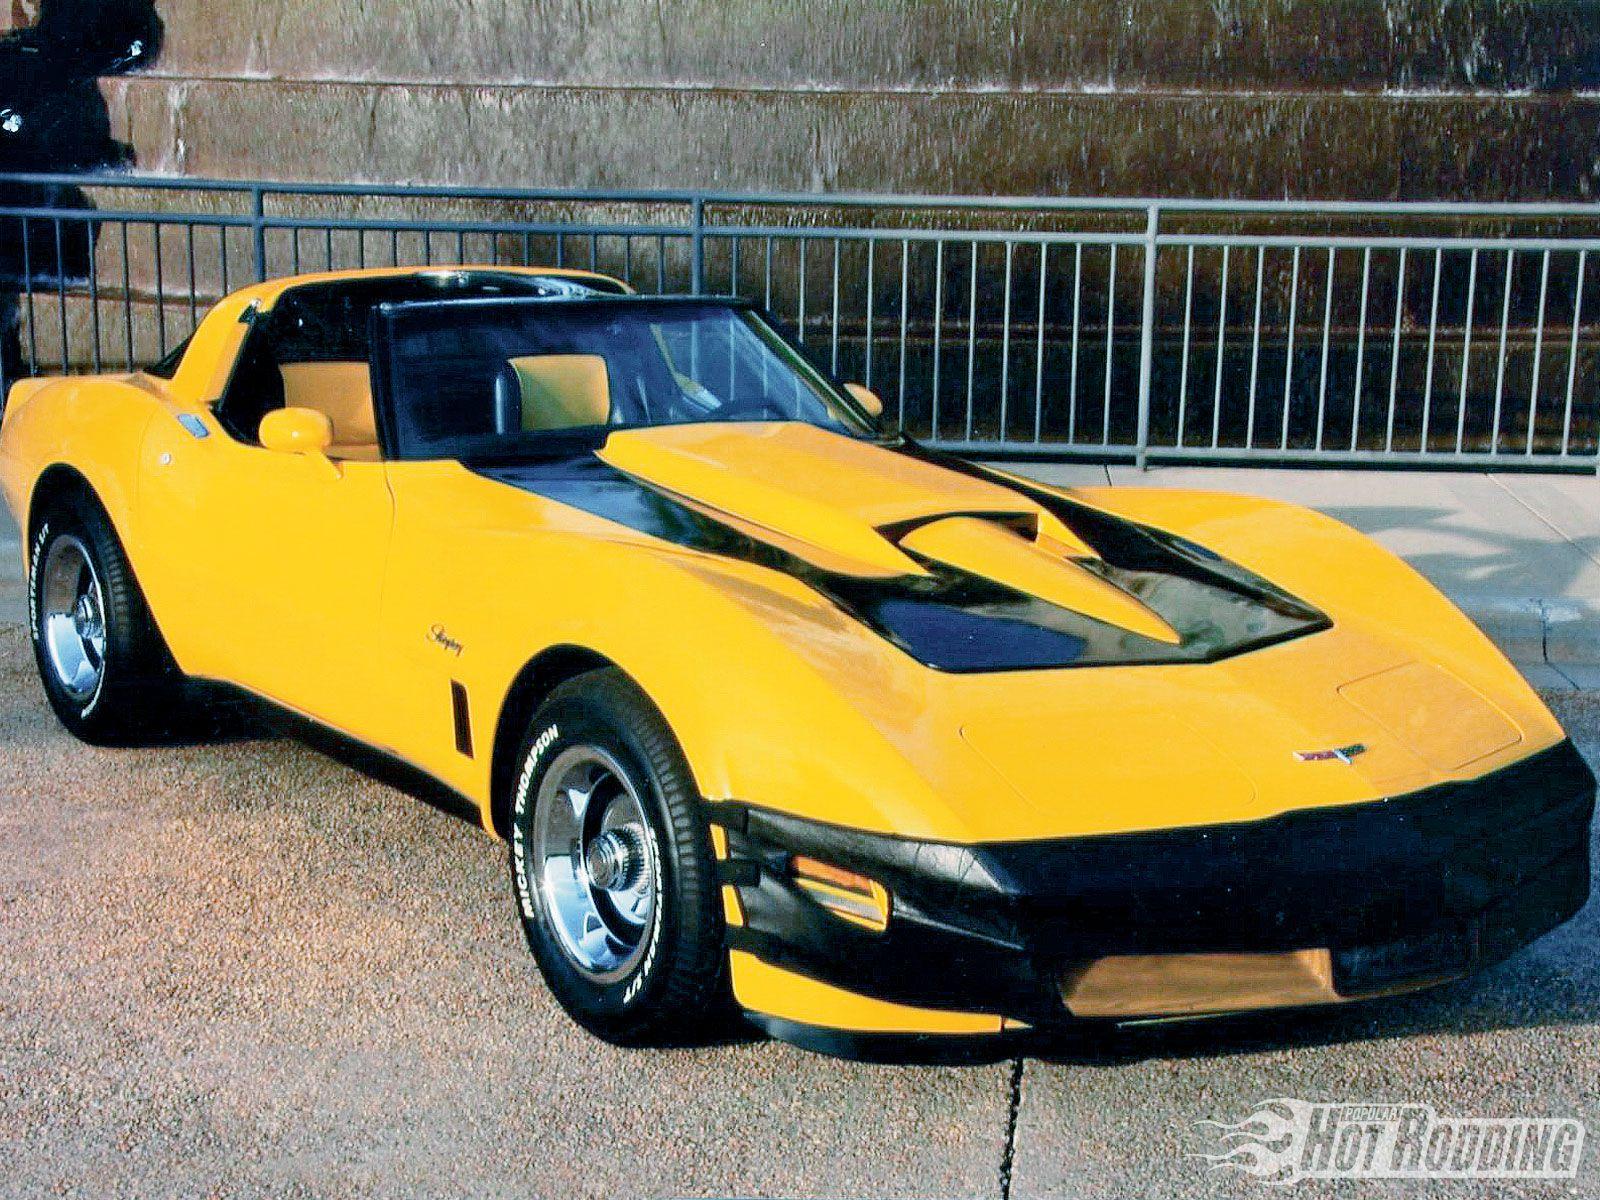 1980 Chevy Corvette Convertible. Maintenance/restoration of old ...